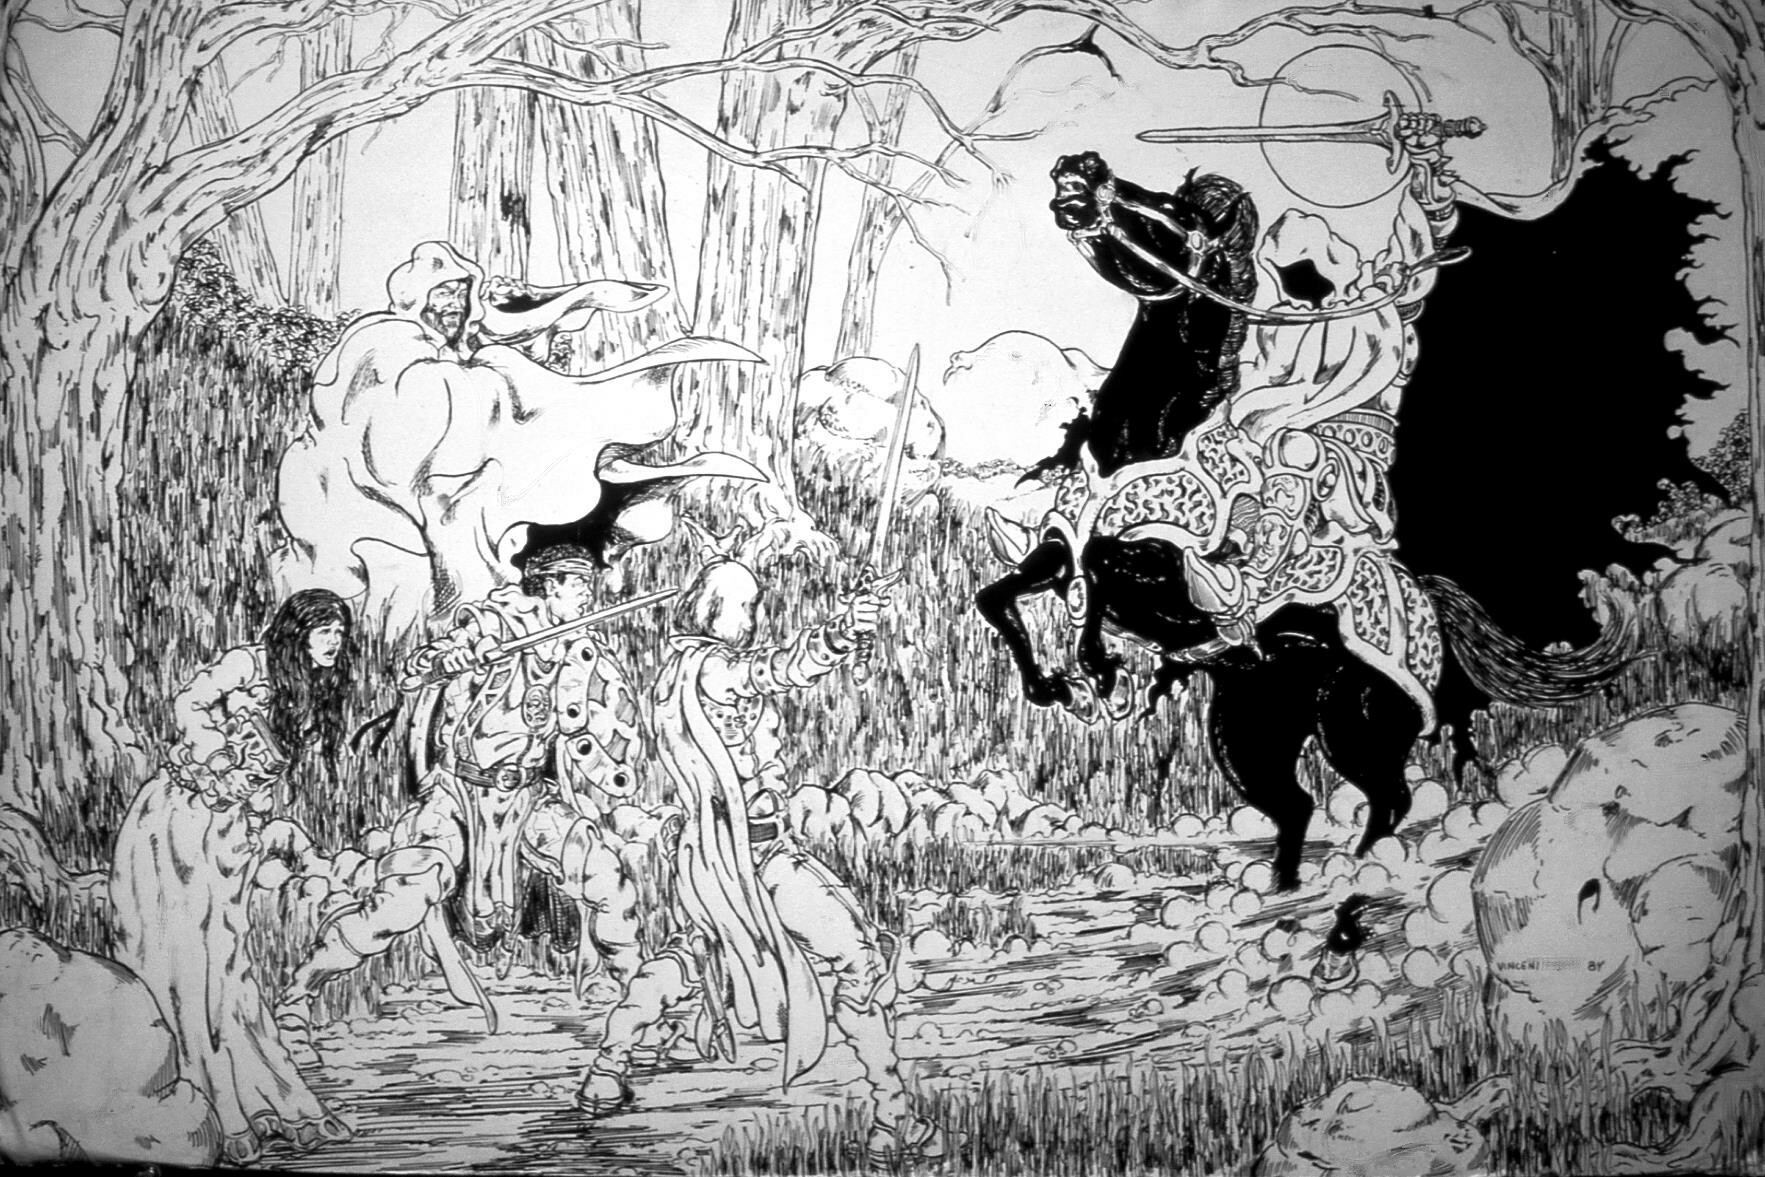 Slide of original 1984 art